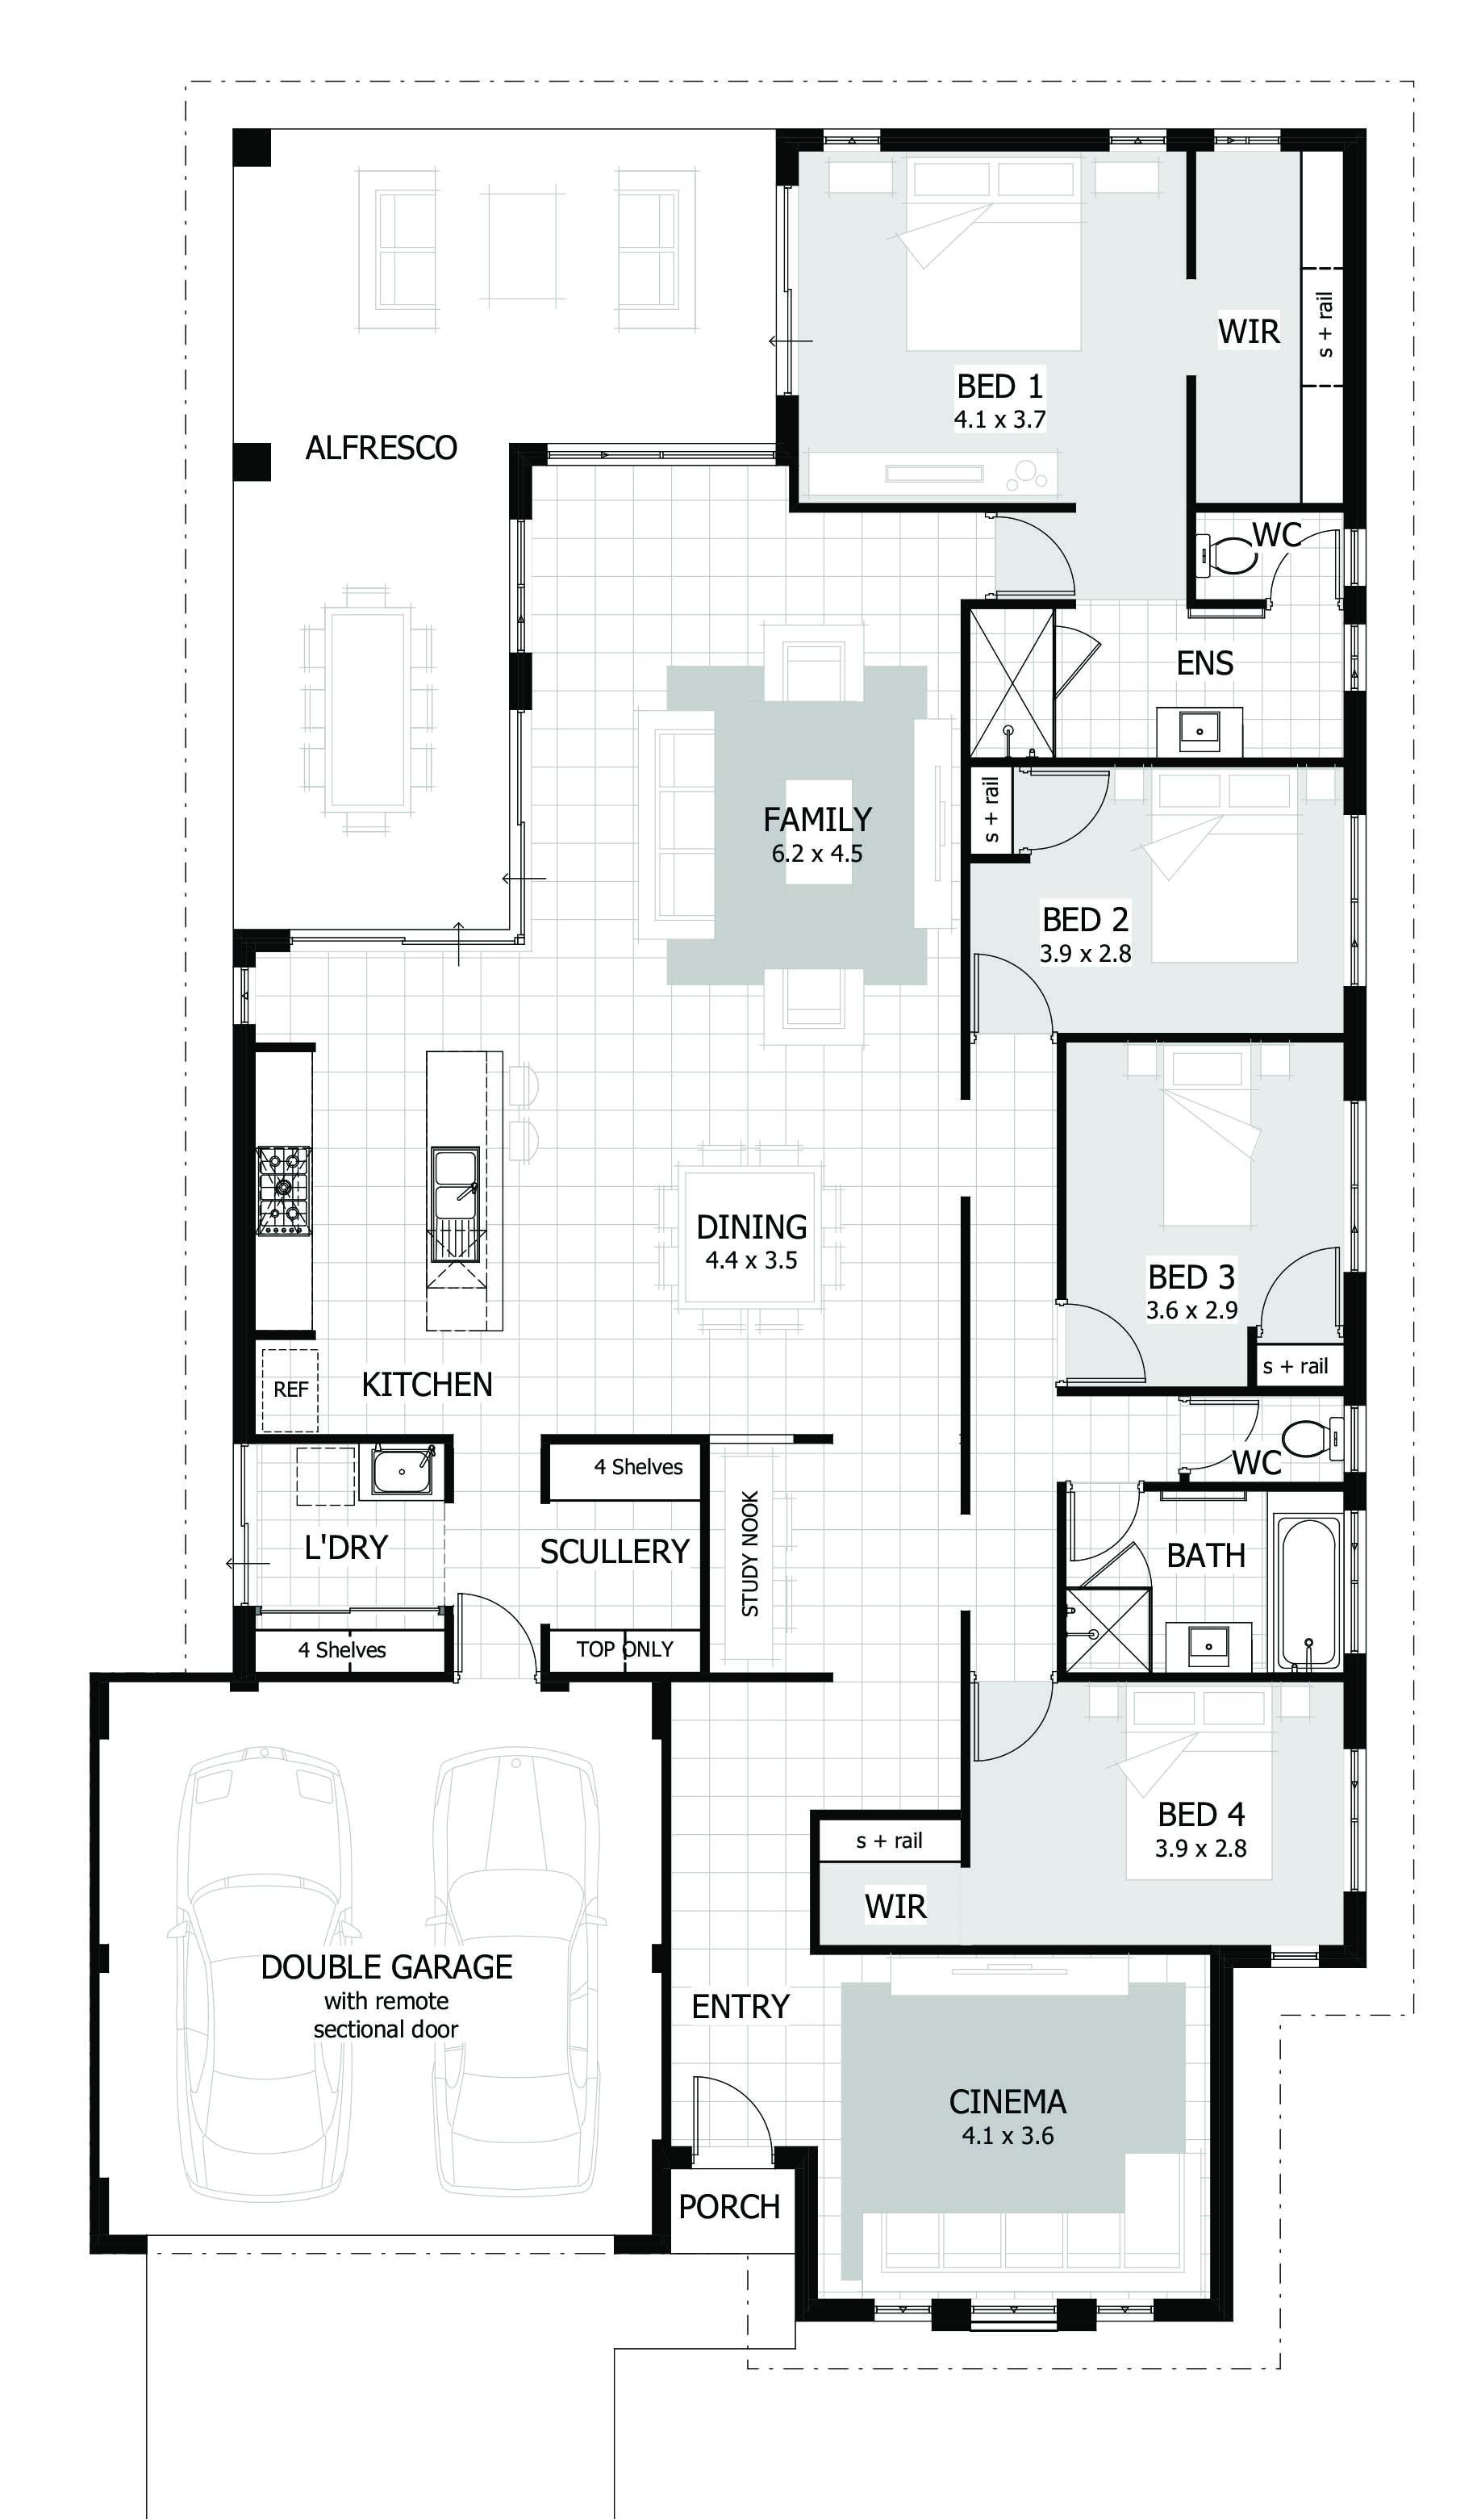 4 bedroom home designs plans